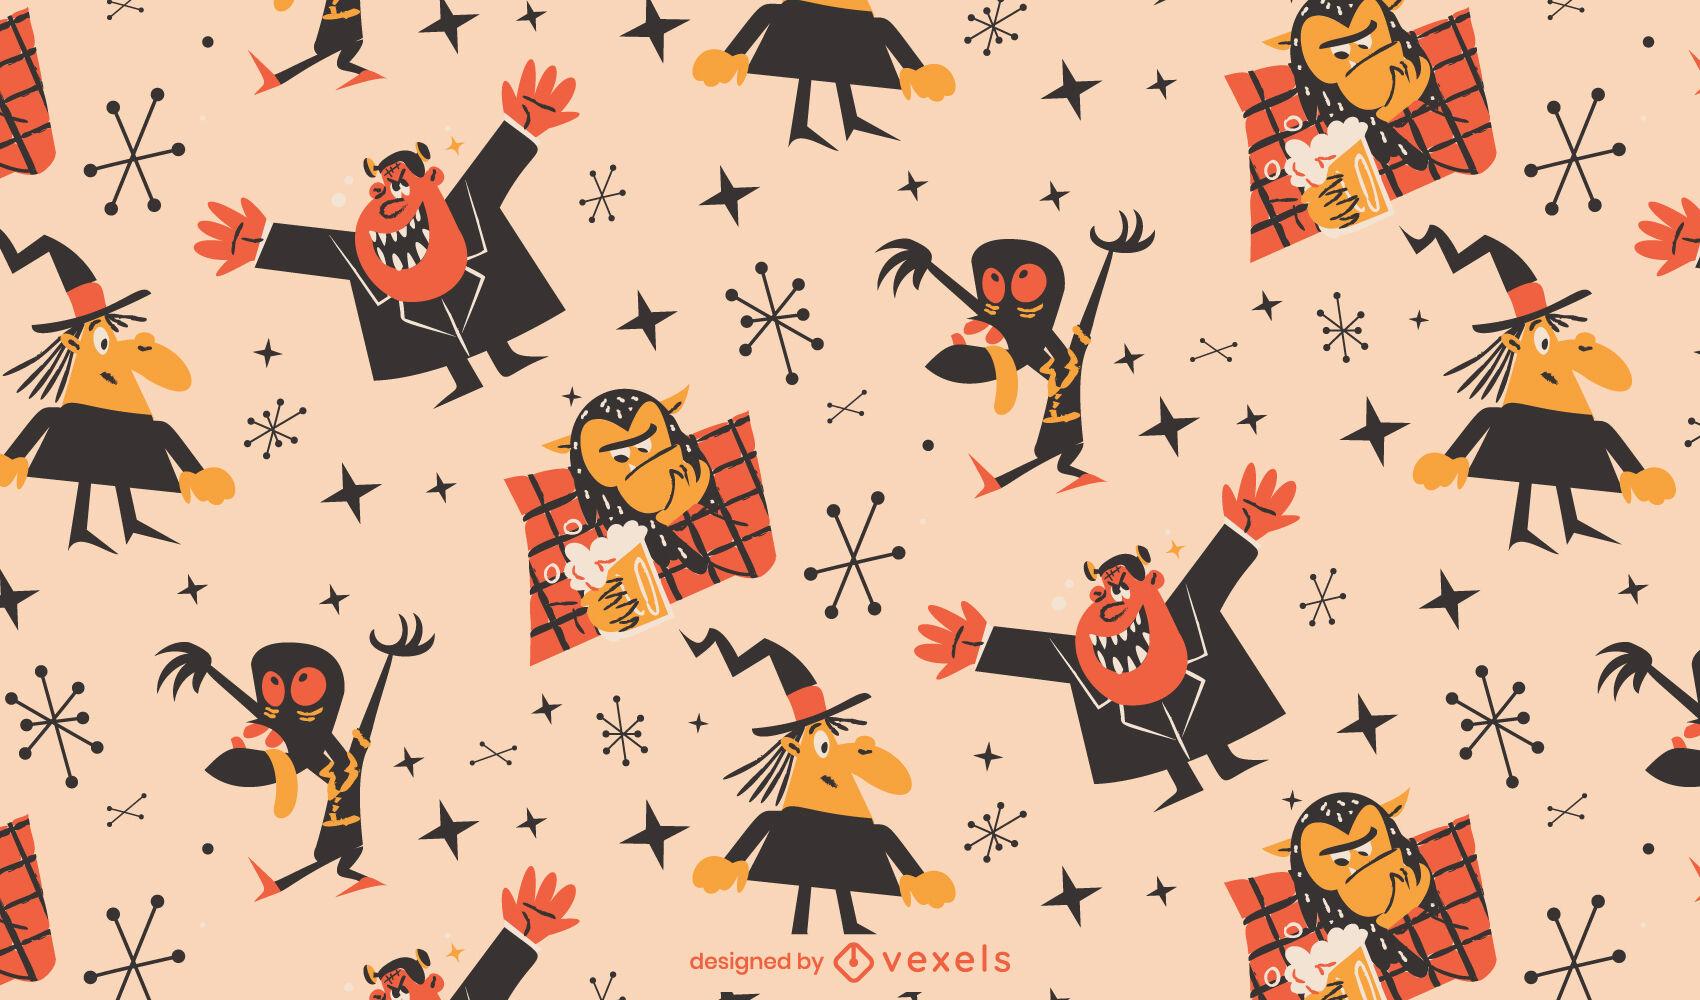 Dibujos animados retro de monstruos de patrón de Halloween